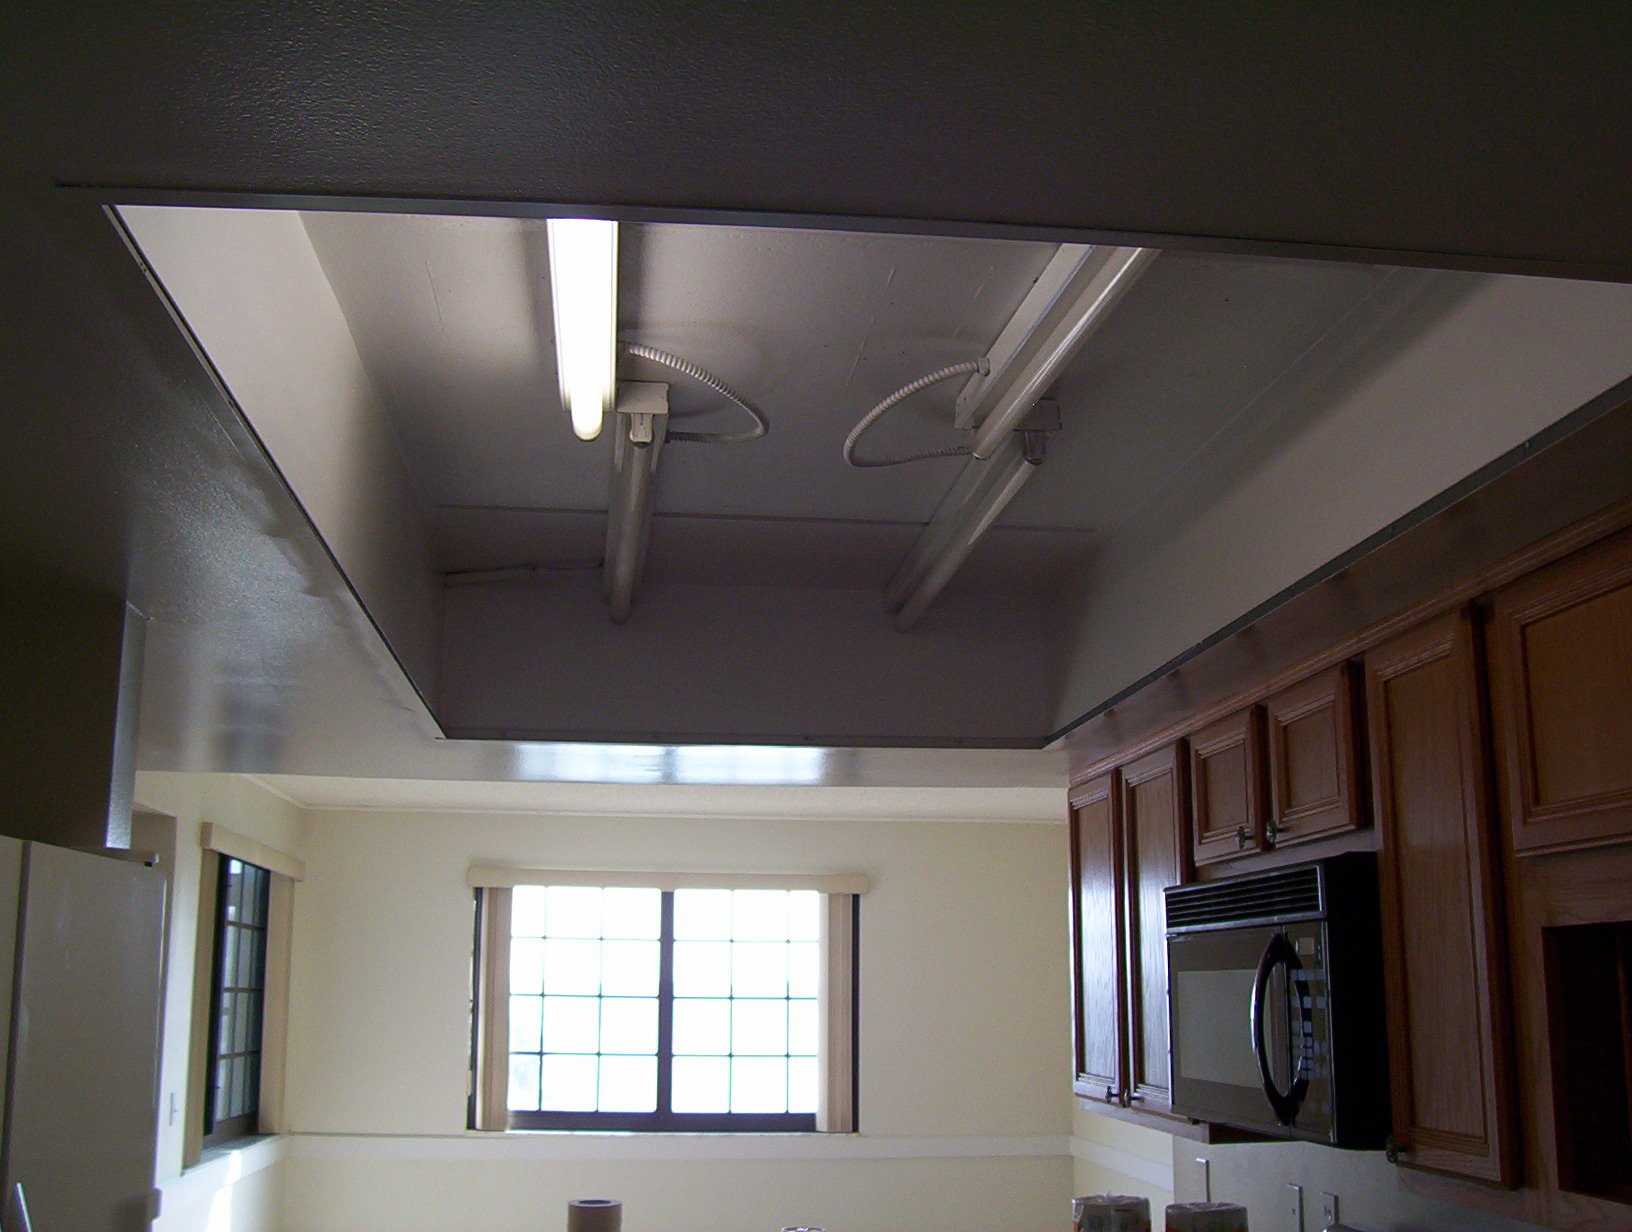 Cocoa beach condo kitchen grid ceiling removed